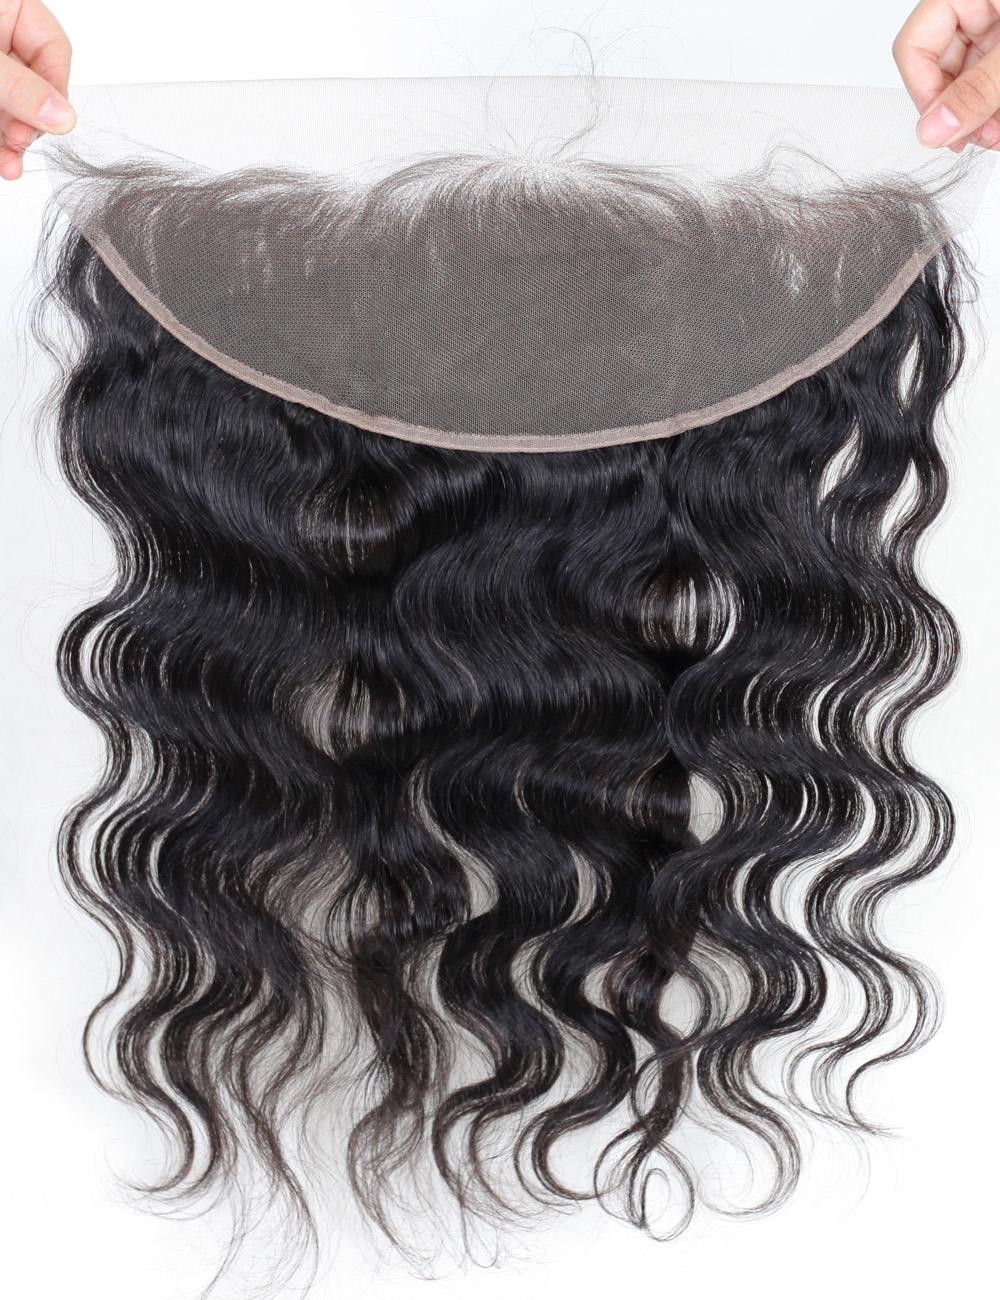 Virgin Human Hair Lace Frontal Wigs (3)